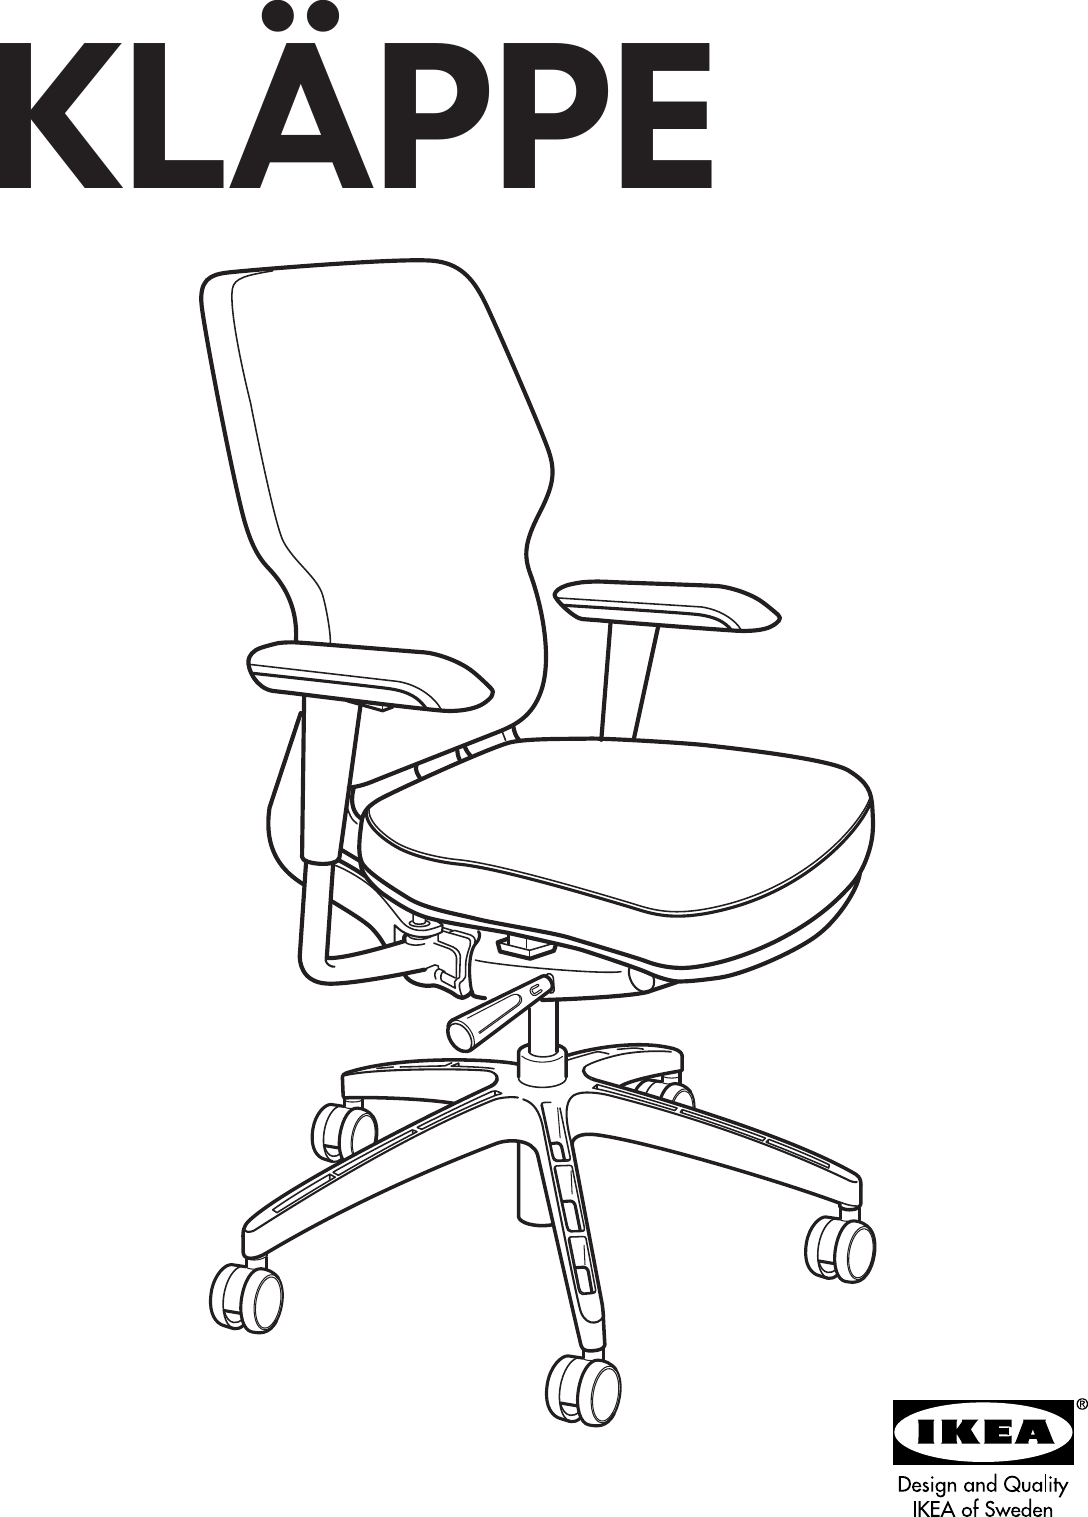 Ikea Klappe Swivel Chair Assembly Instruction